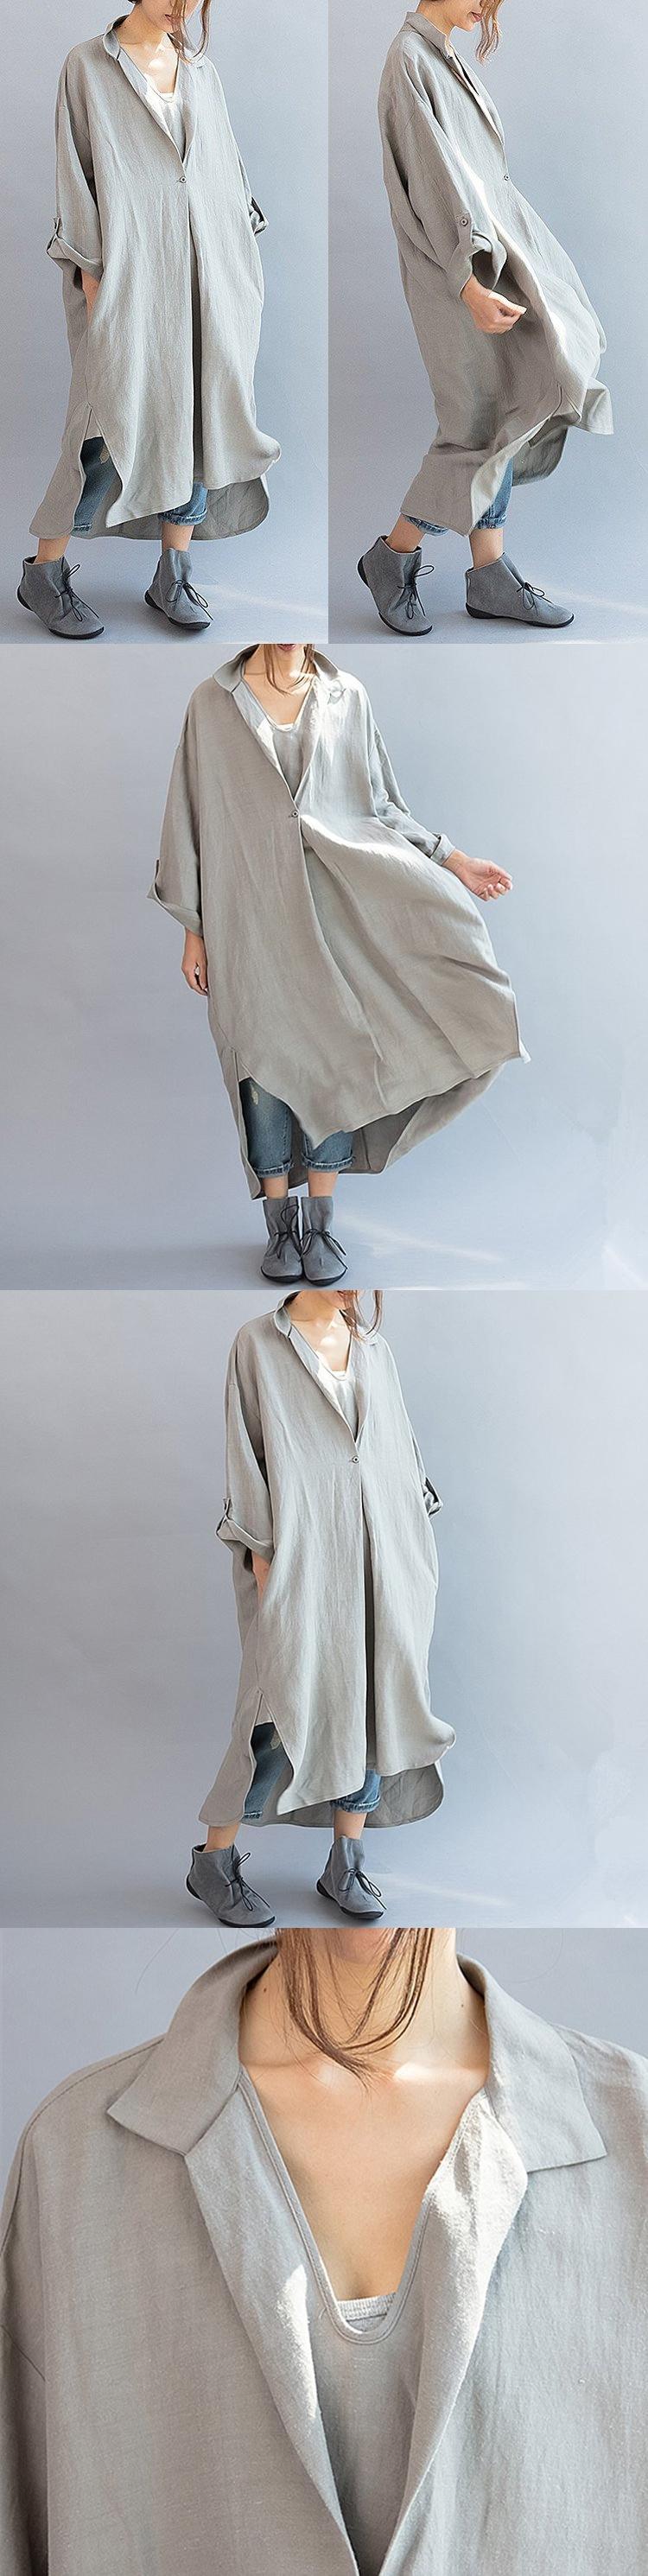 Women Cotton Linen Casual Loose Fitting Summer Dress Odezhda Boho Vykrojki Odezhdy [ 2981 x 750 Pixel ]